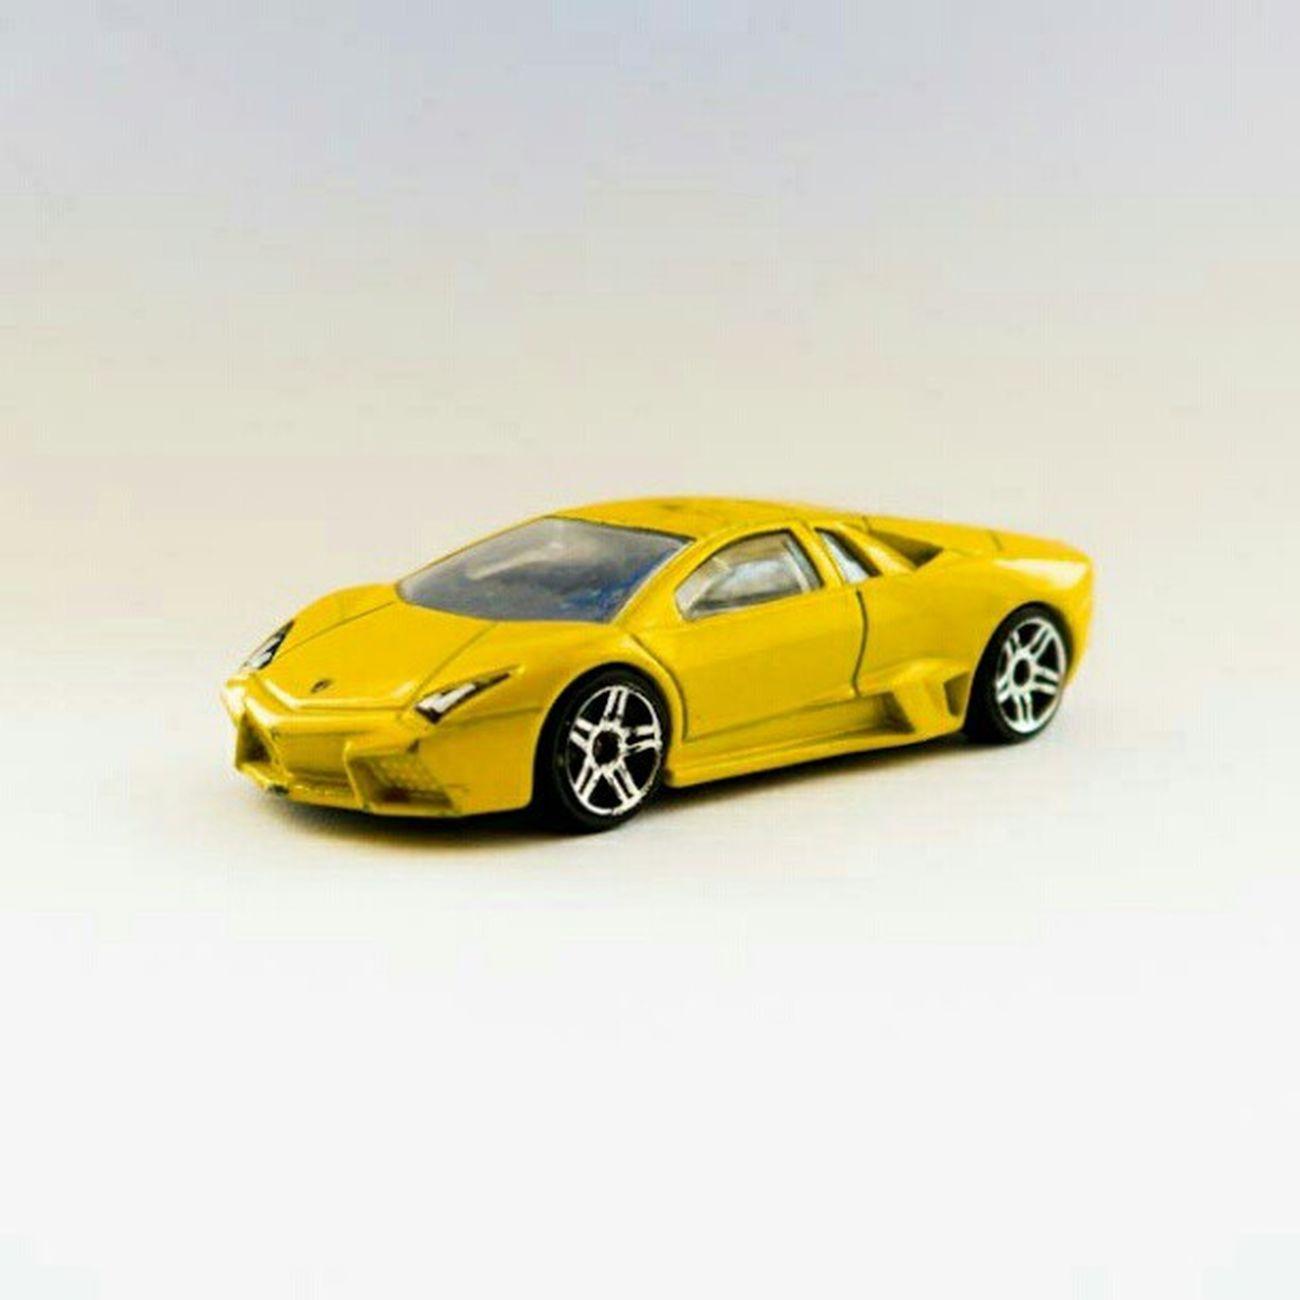 Fotos del micro estudio improvisado Landscape Love Toys Studio Yellow Lamborgini  Instamood Instagood Igers Professional Microstudio